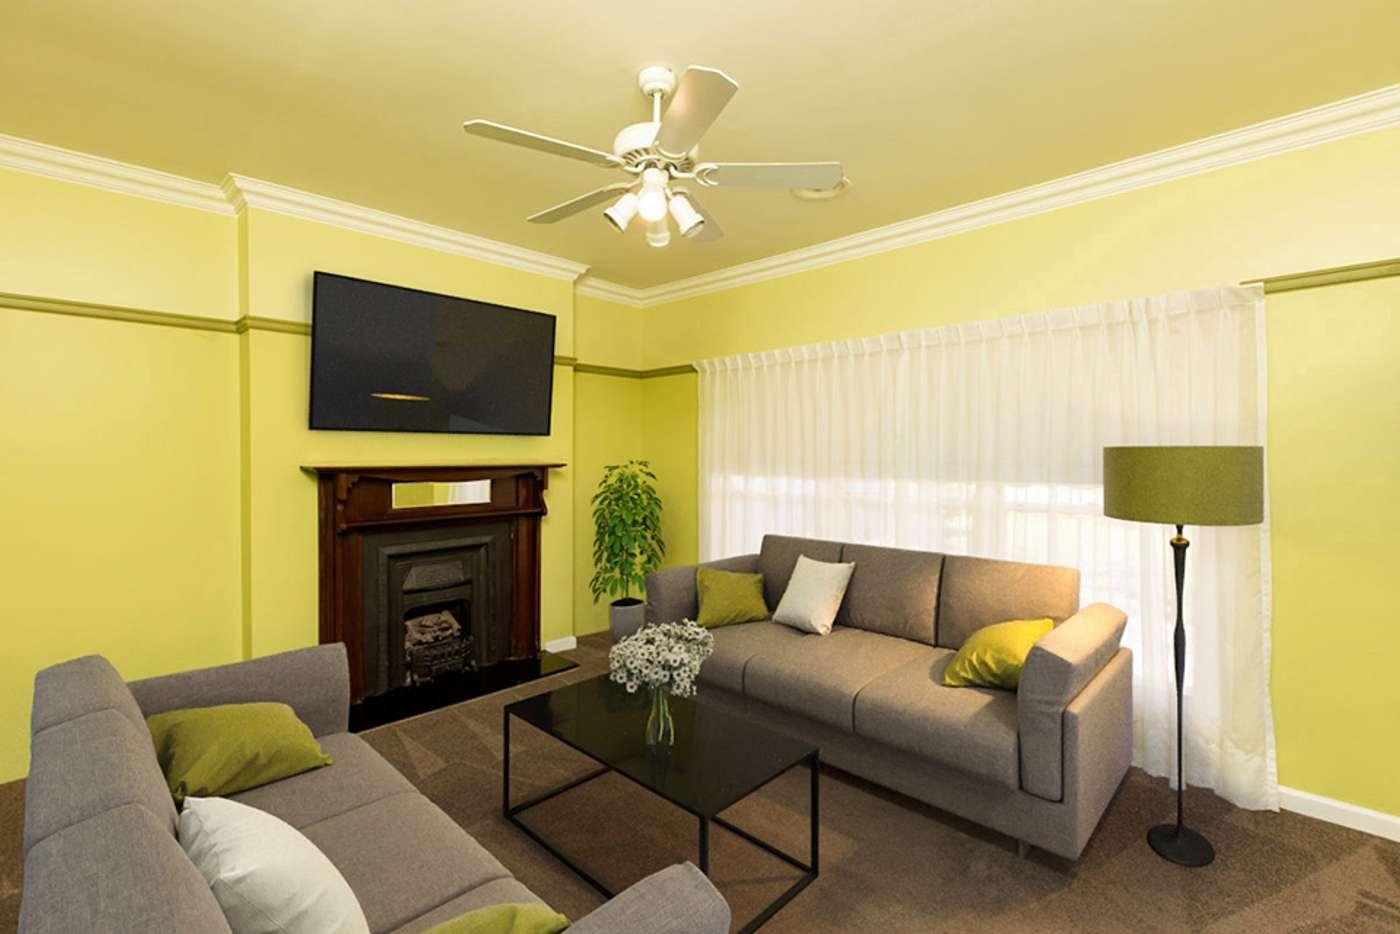 Sixth view of Homely house listing, 279 Eleventh Street, Mildura VIC 3500